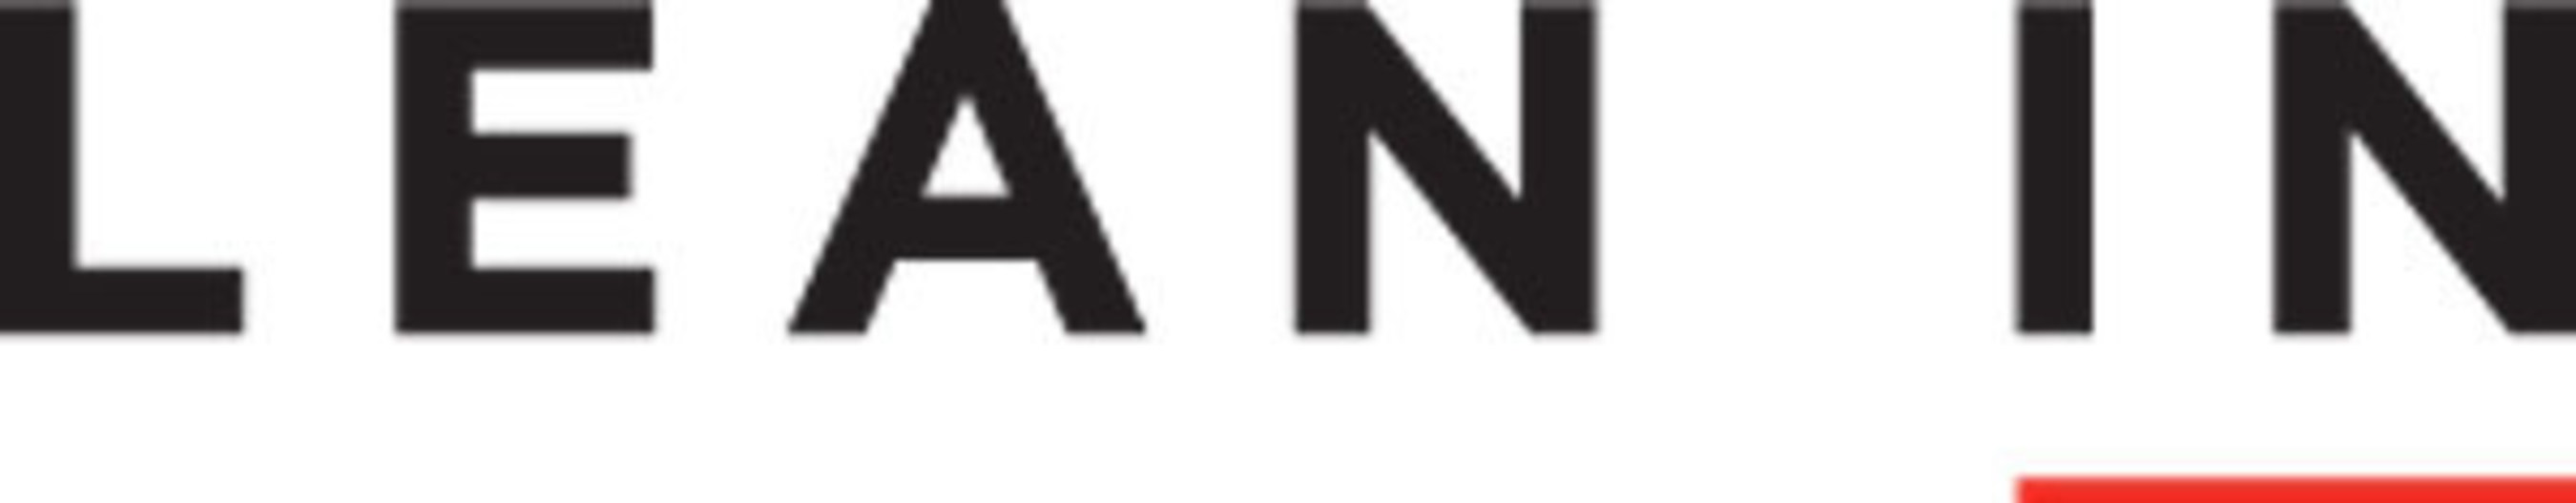 LeanIn.Org